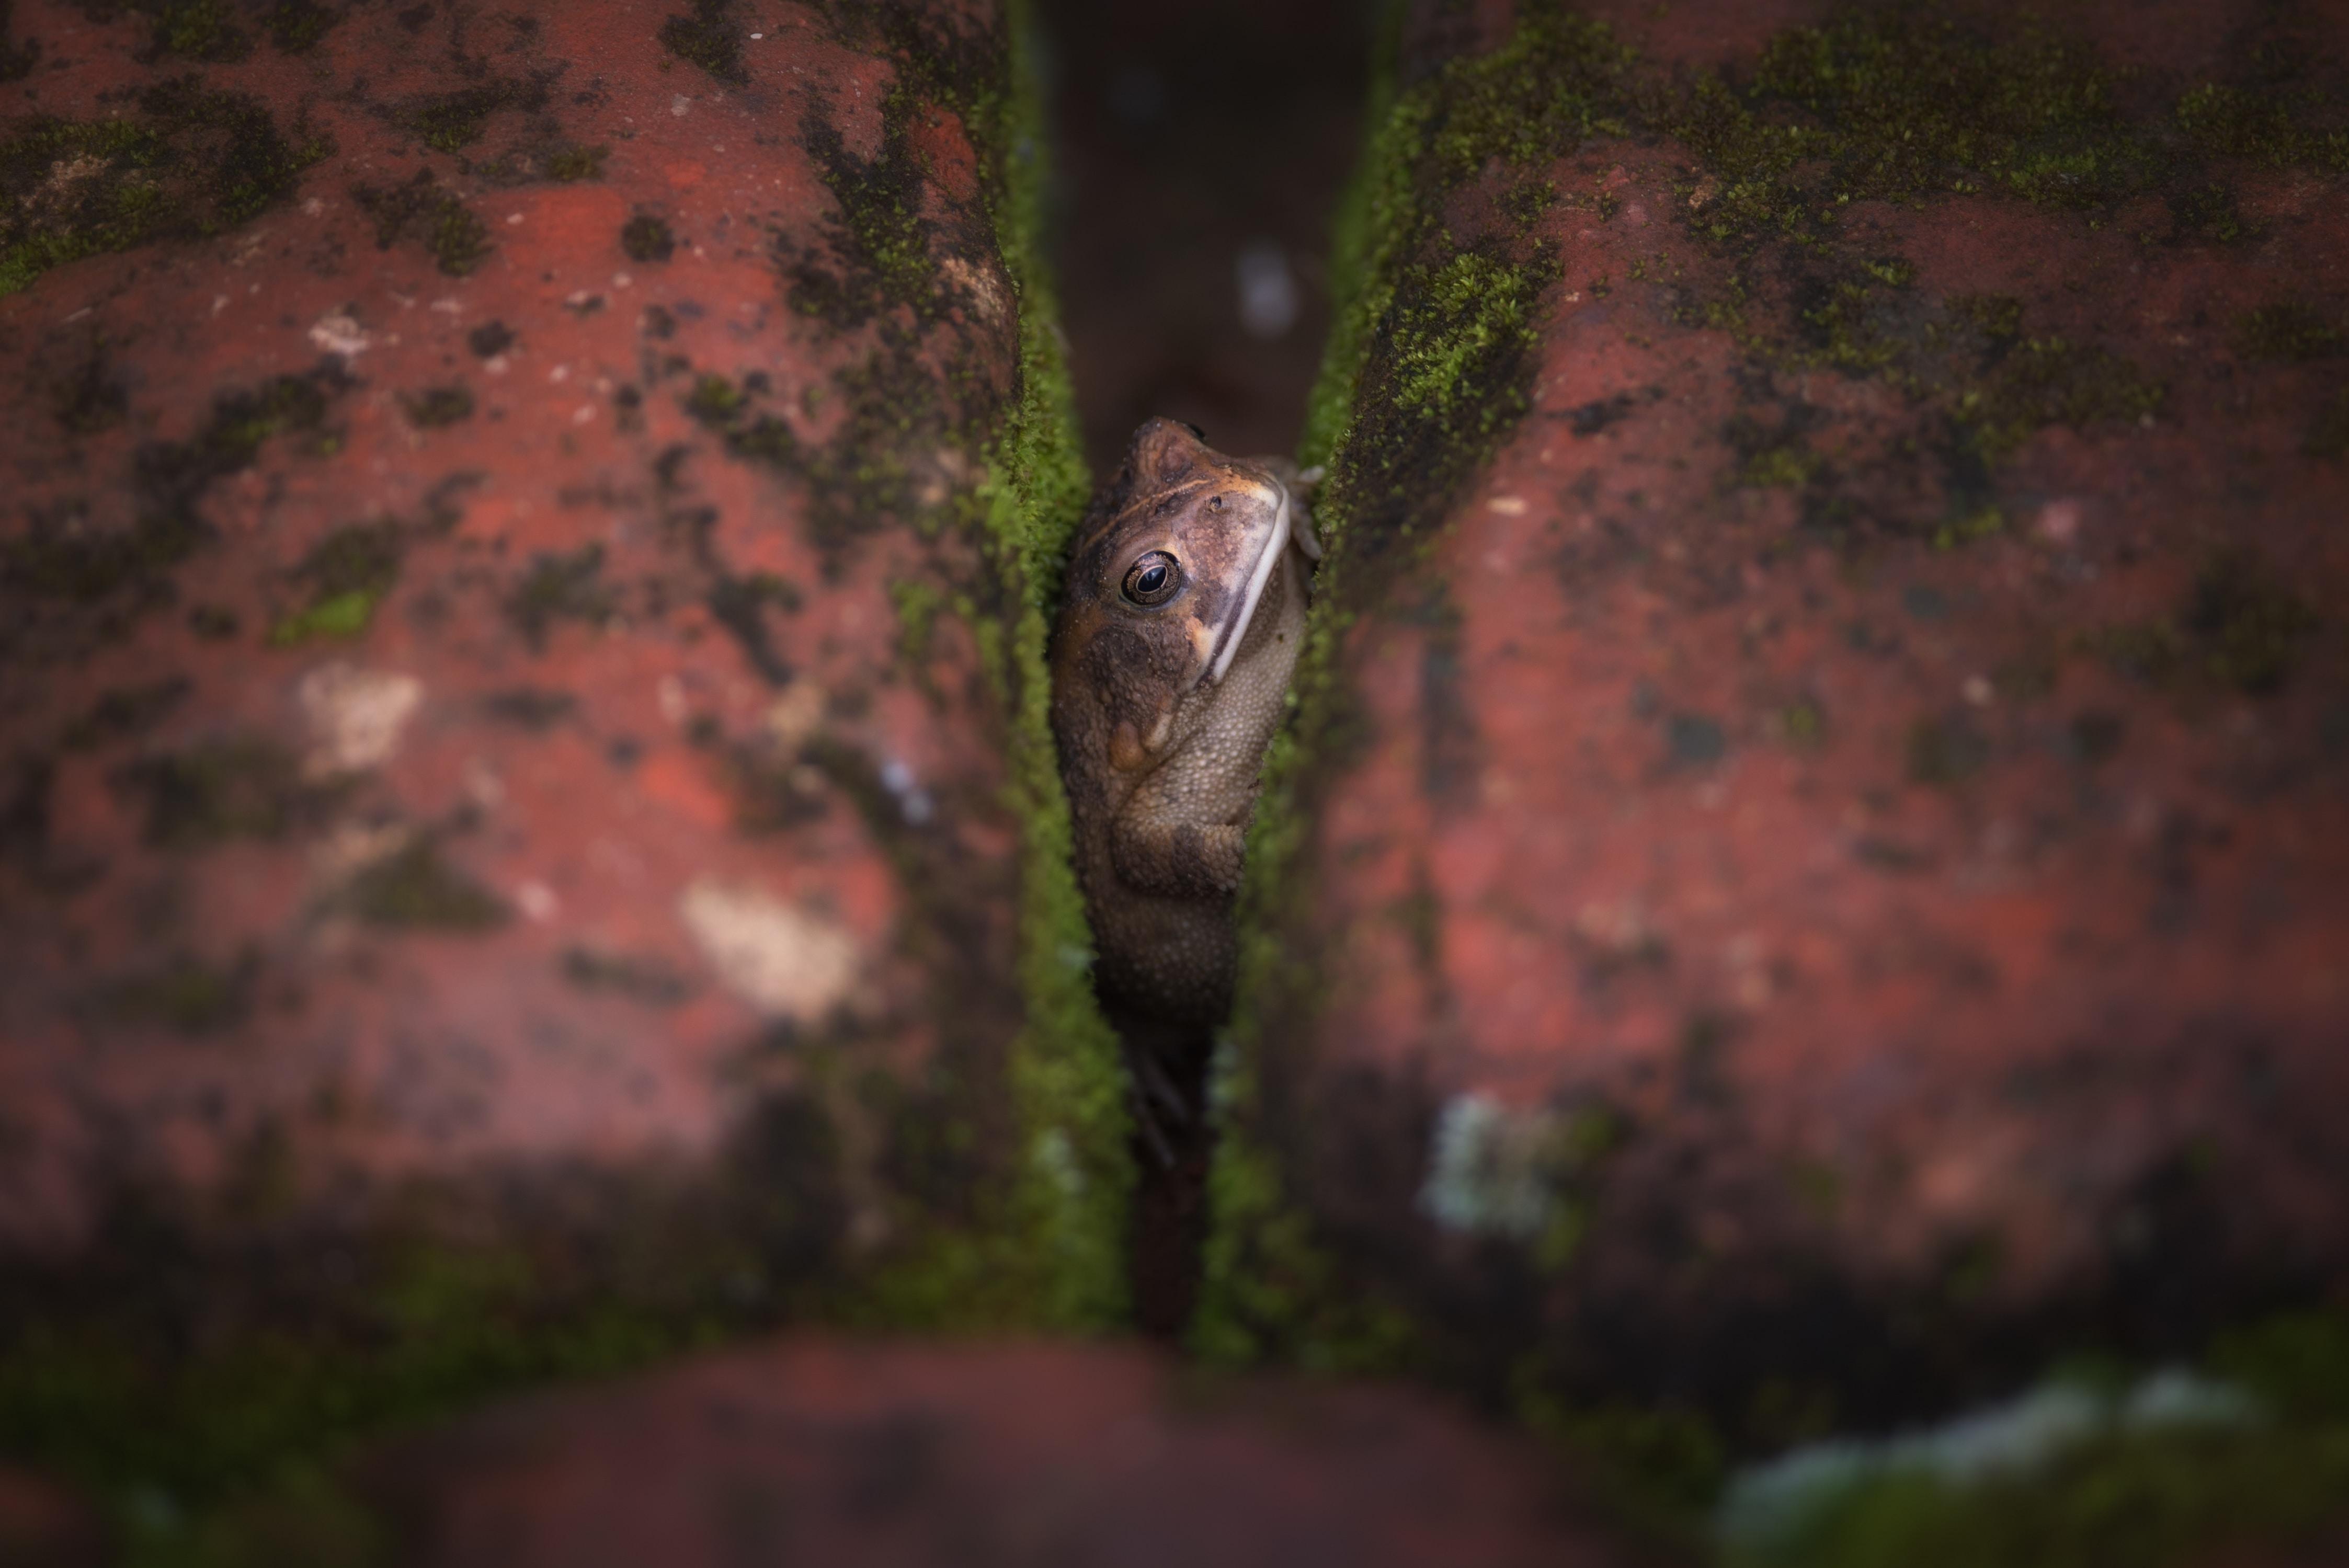 selective focus photography of frog between blocks